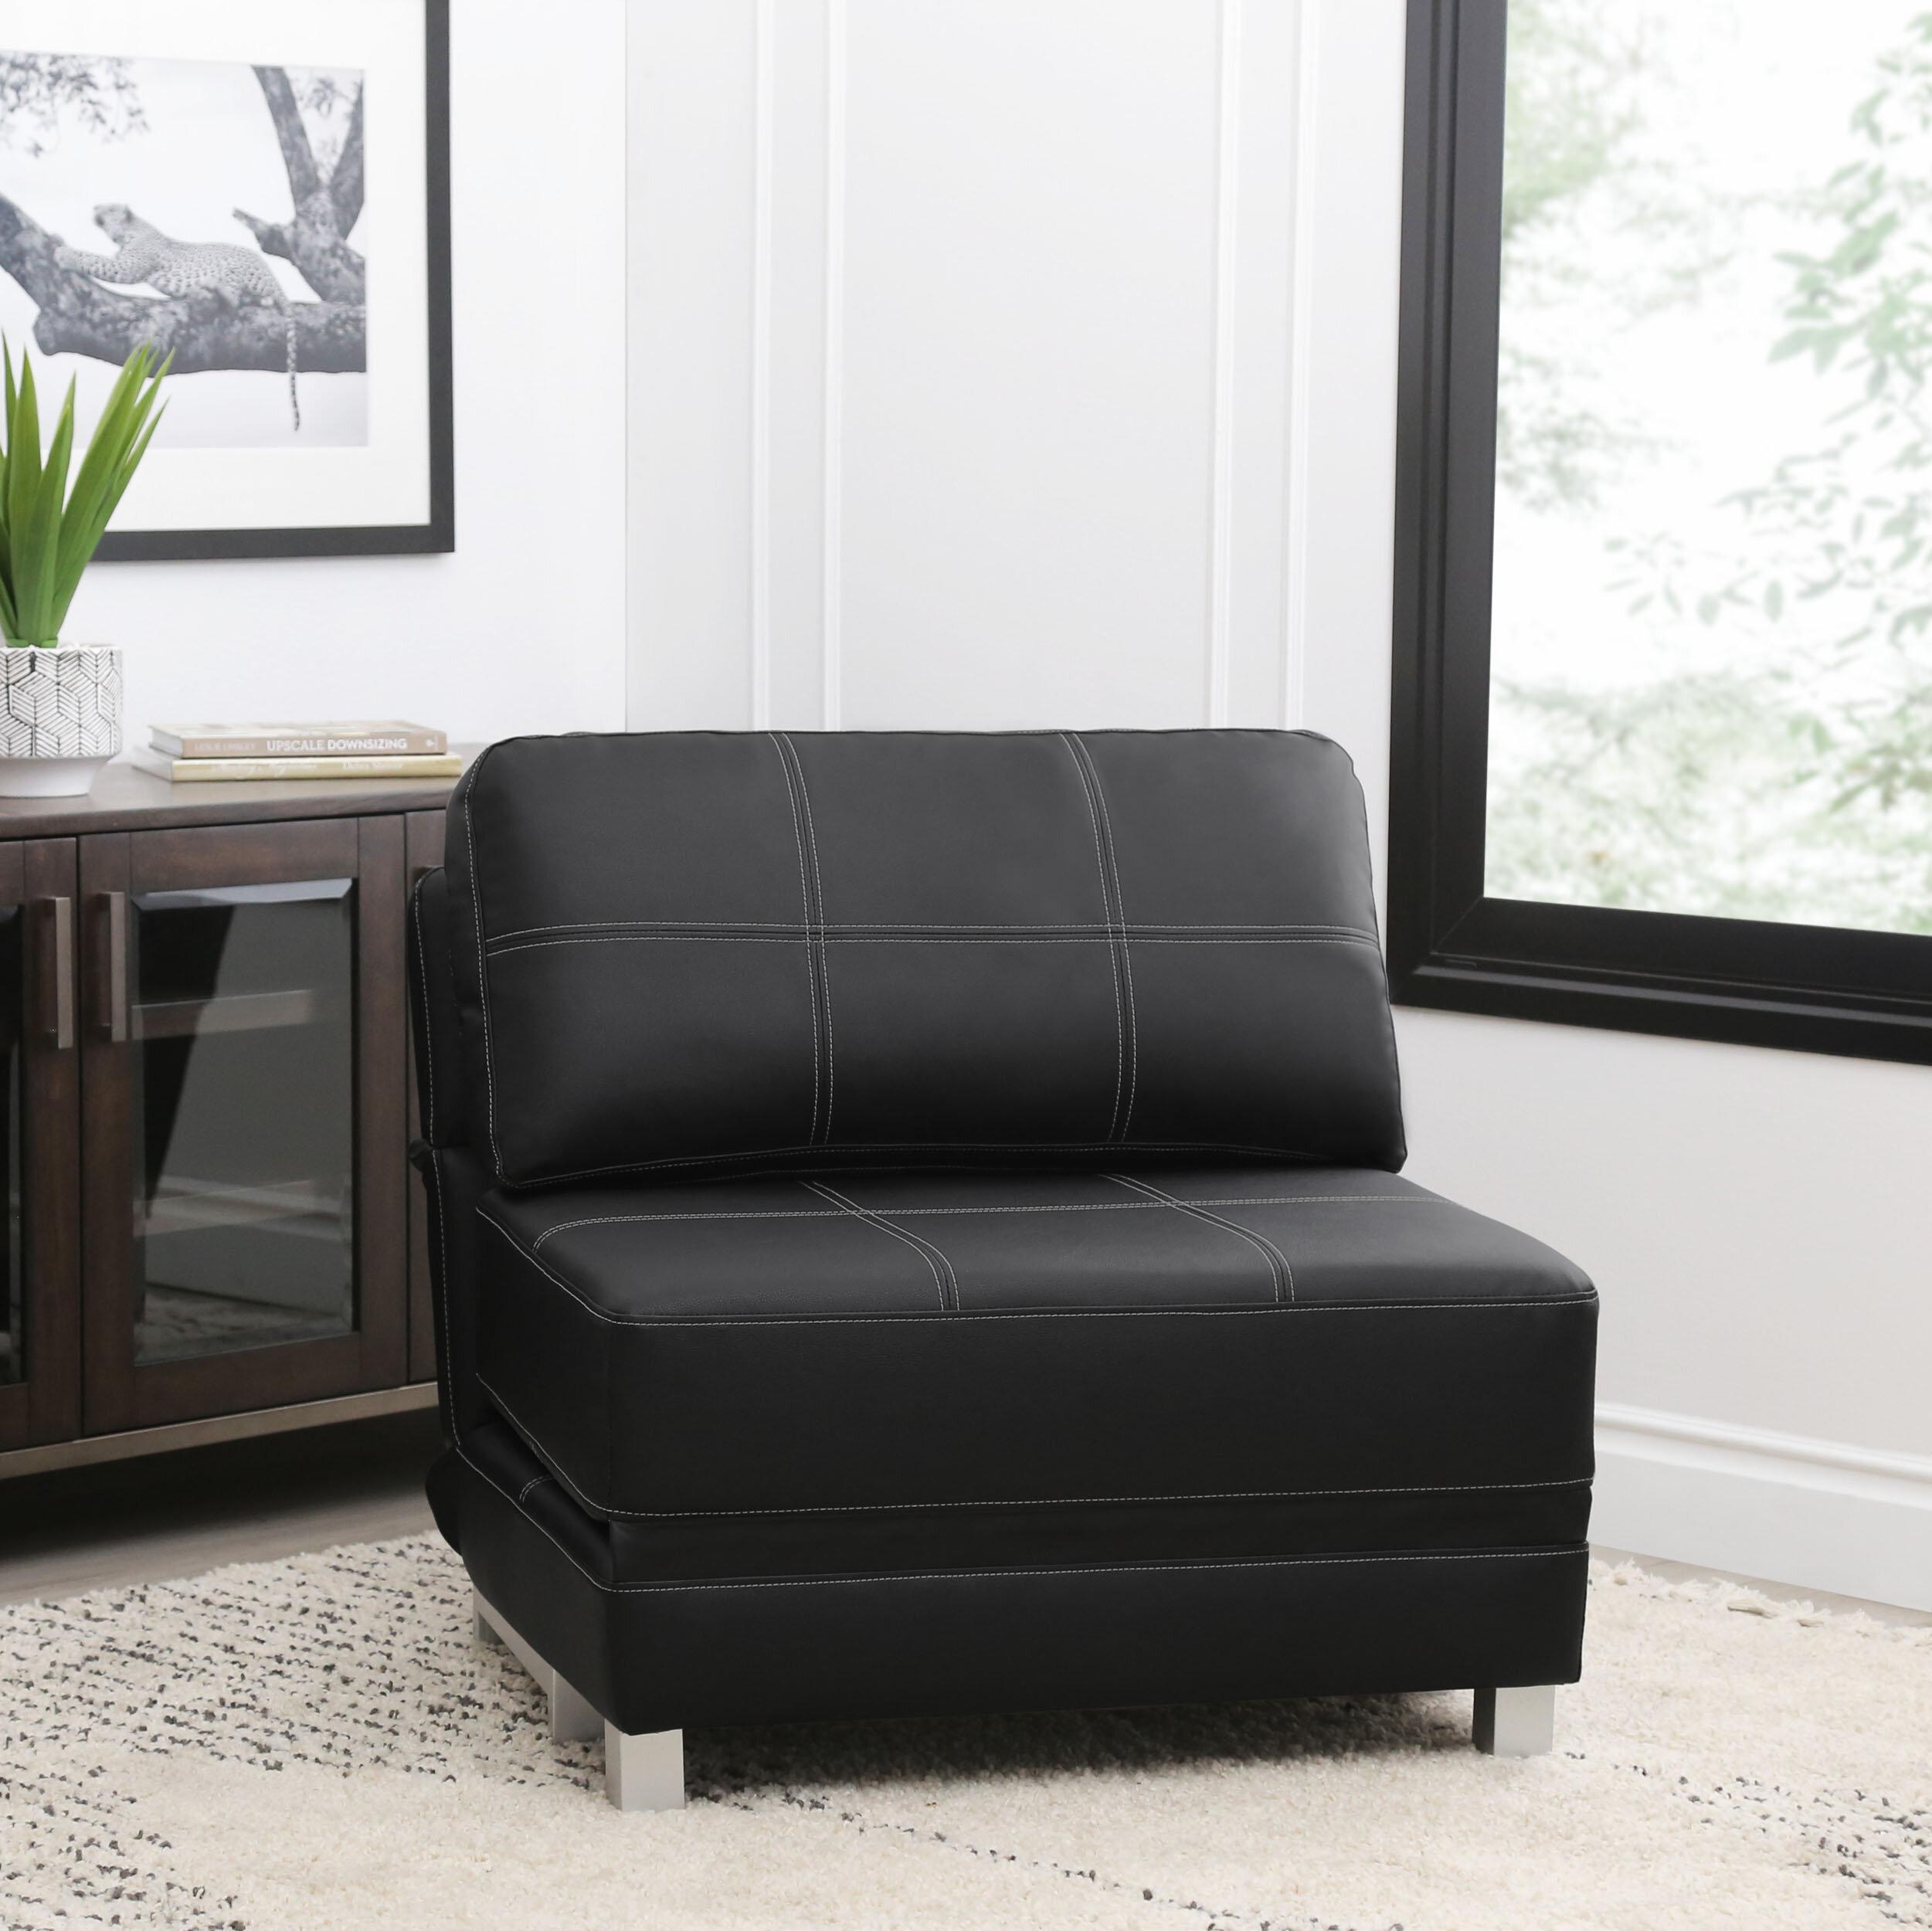 Latitude Run Windle Convertible Futon Chair Reviews